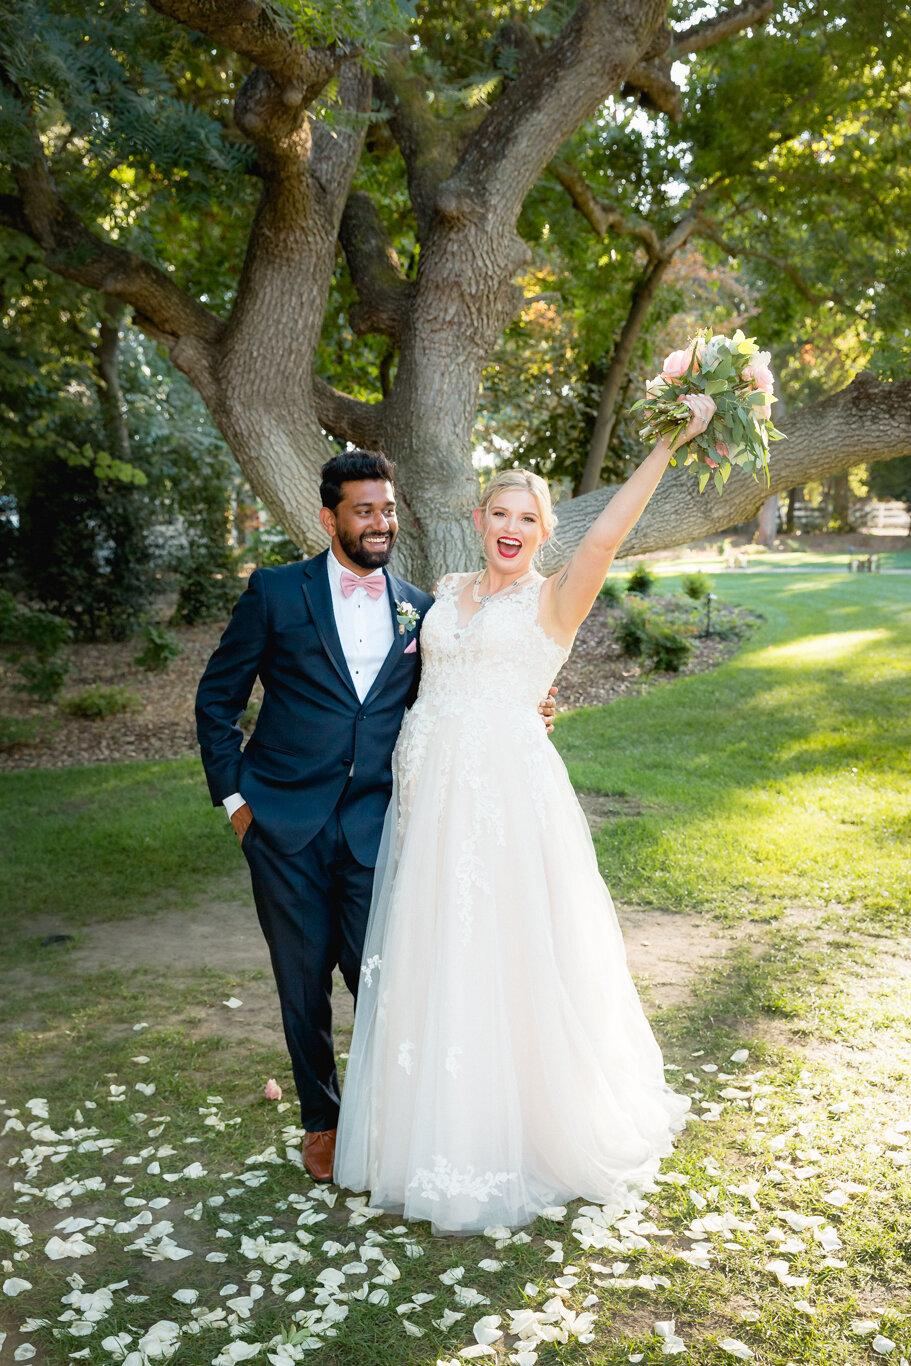 2019.08.24_Emily-Ashir-Wedding-at-the-Maples-6073.jpg